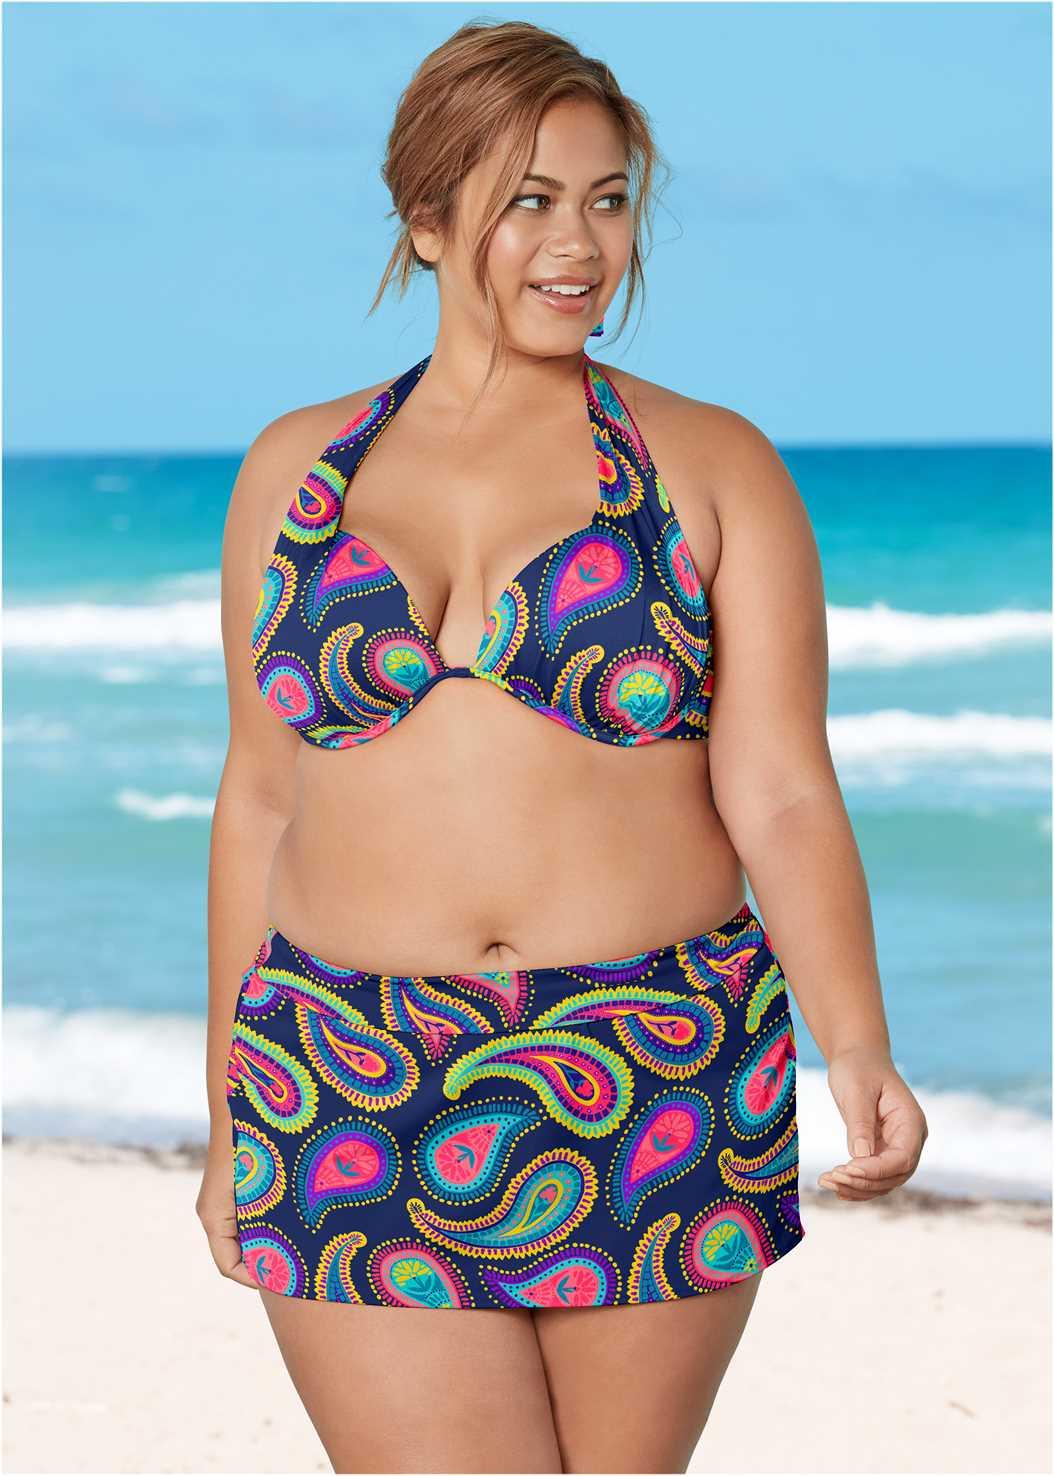 Marilyn Underwire Push Up Halter Top,Mid Rise Swim Skirt Bikini Bottom,Lattice Side Bikini Bottom,Adjustable Side Swim Short